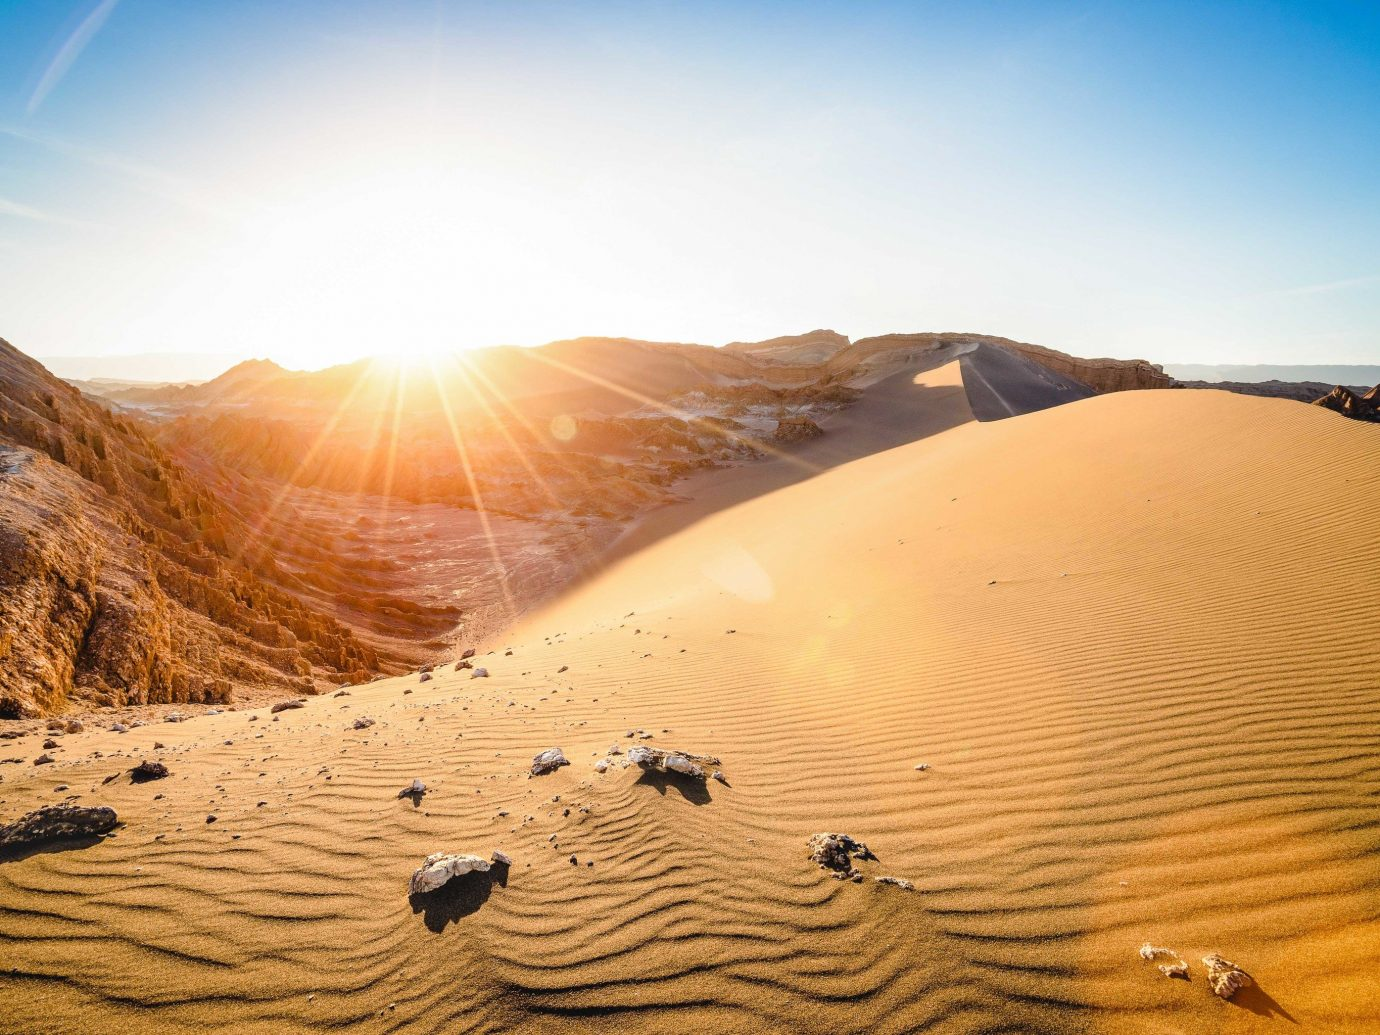 Desert erg aeolian landform singing sand sand sky sahara dune landscape ecoregion geology formation sunlight wadi material horizon